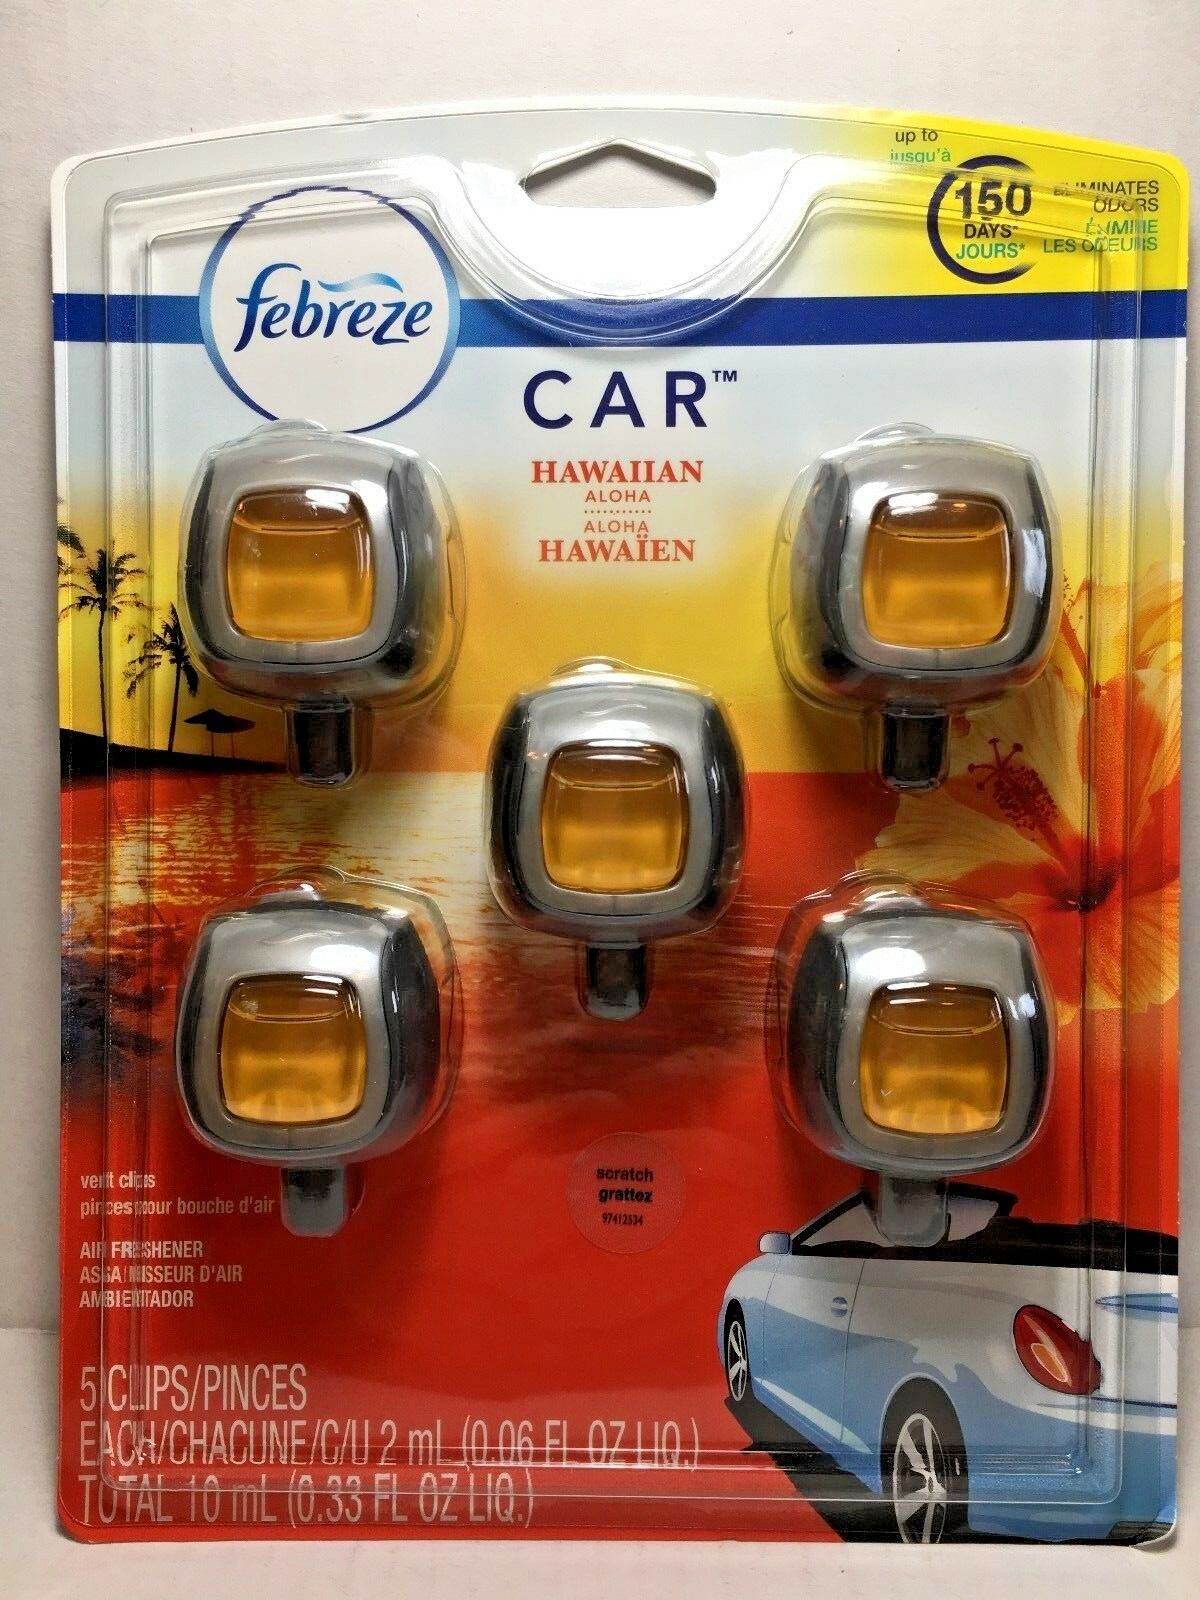 FEBREZE Car Vent Clips 2 ml Air Freshener Hawaiian Aloha - 1